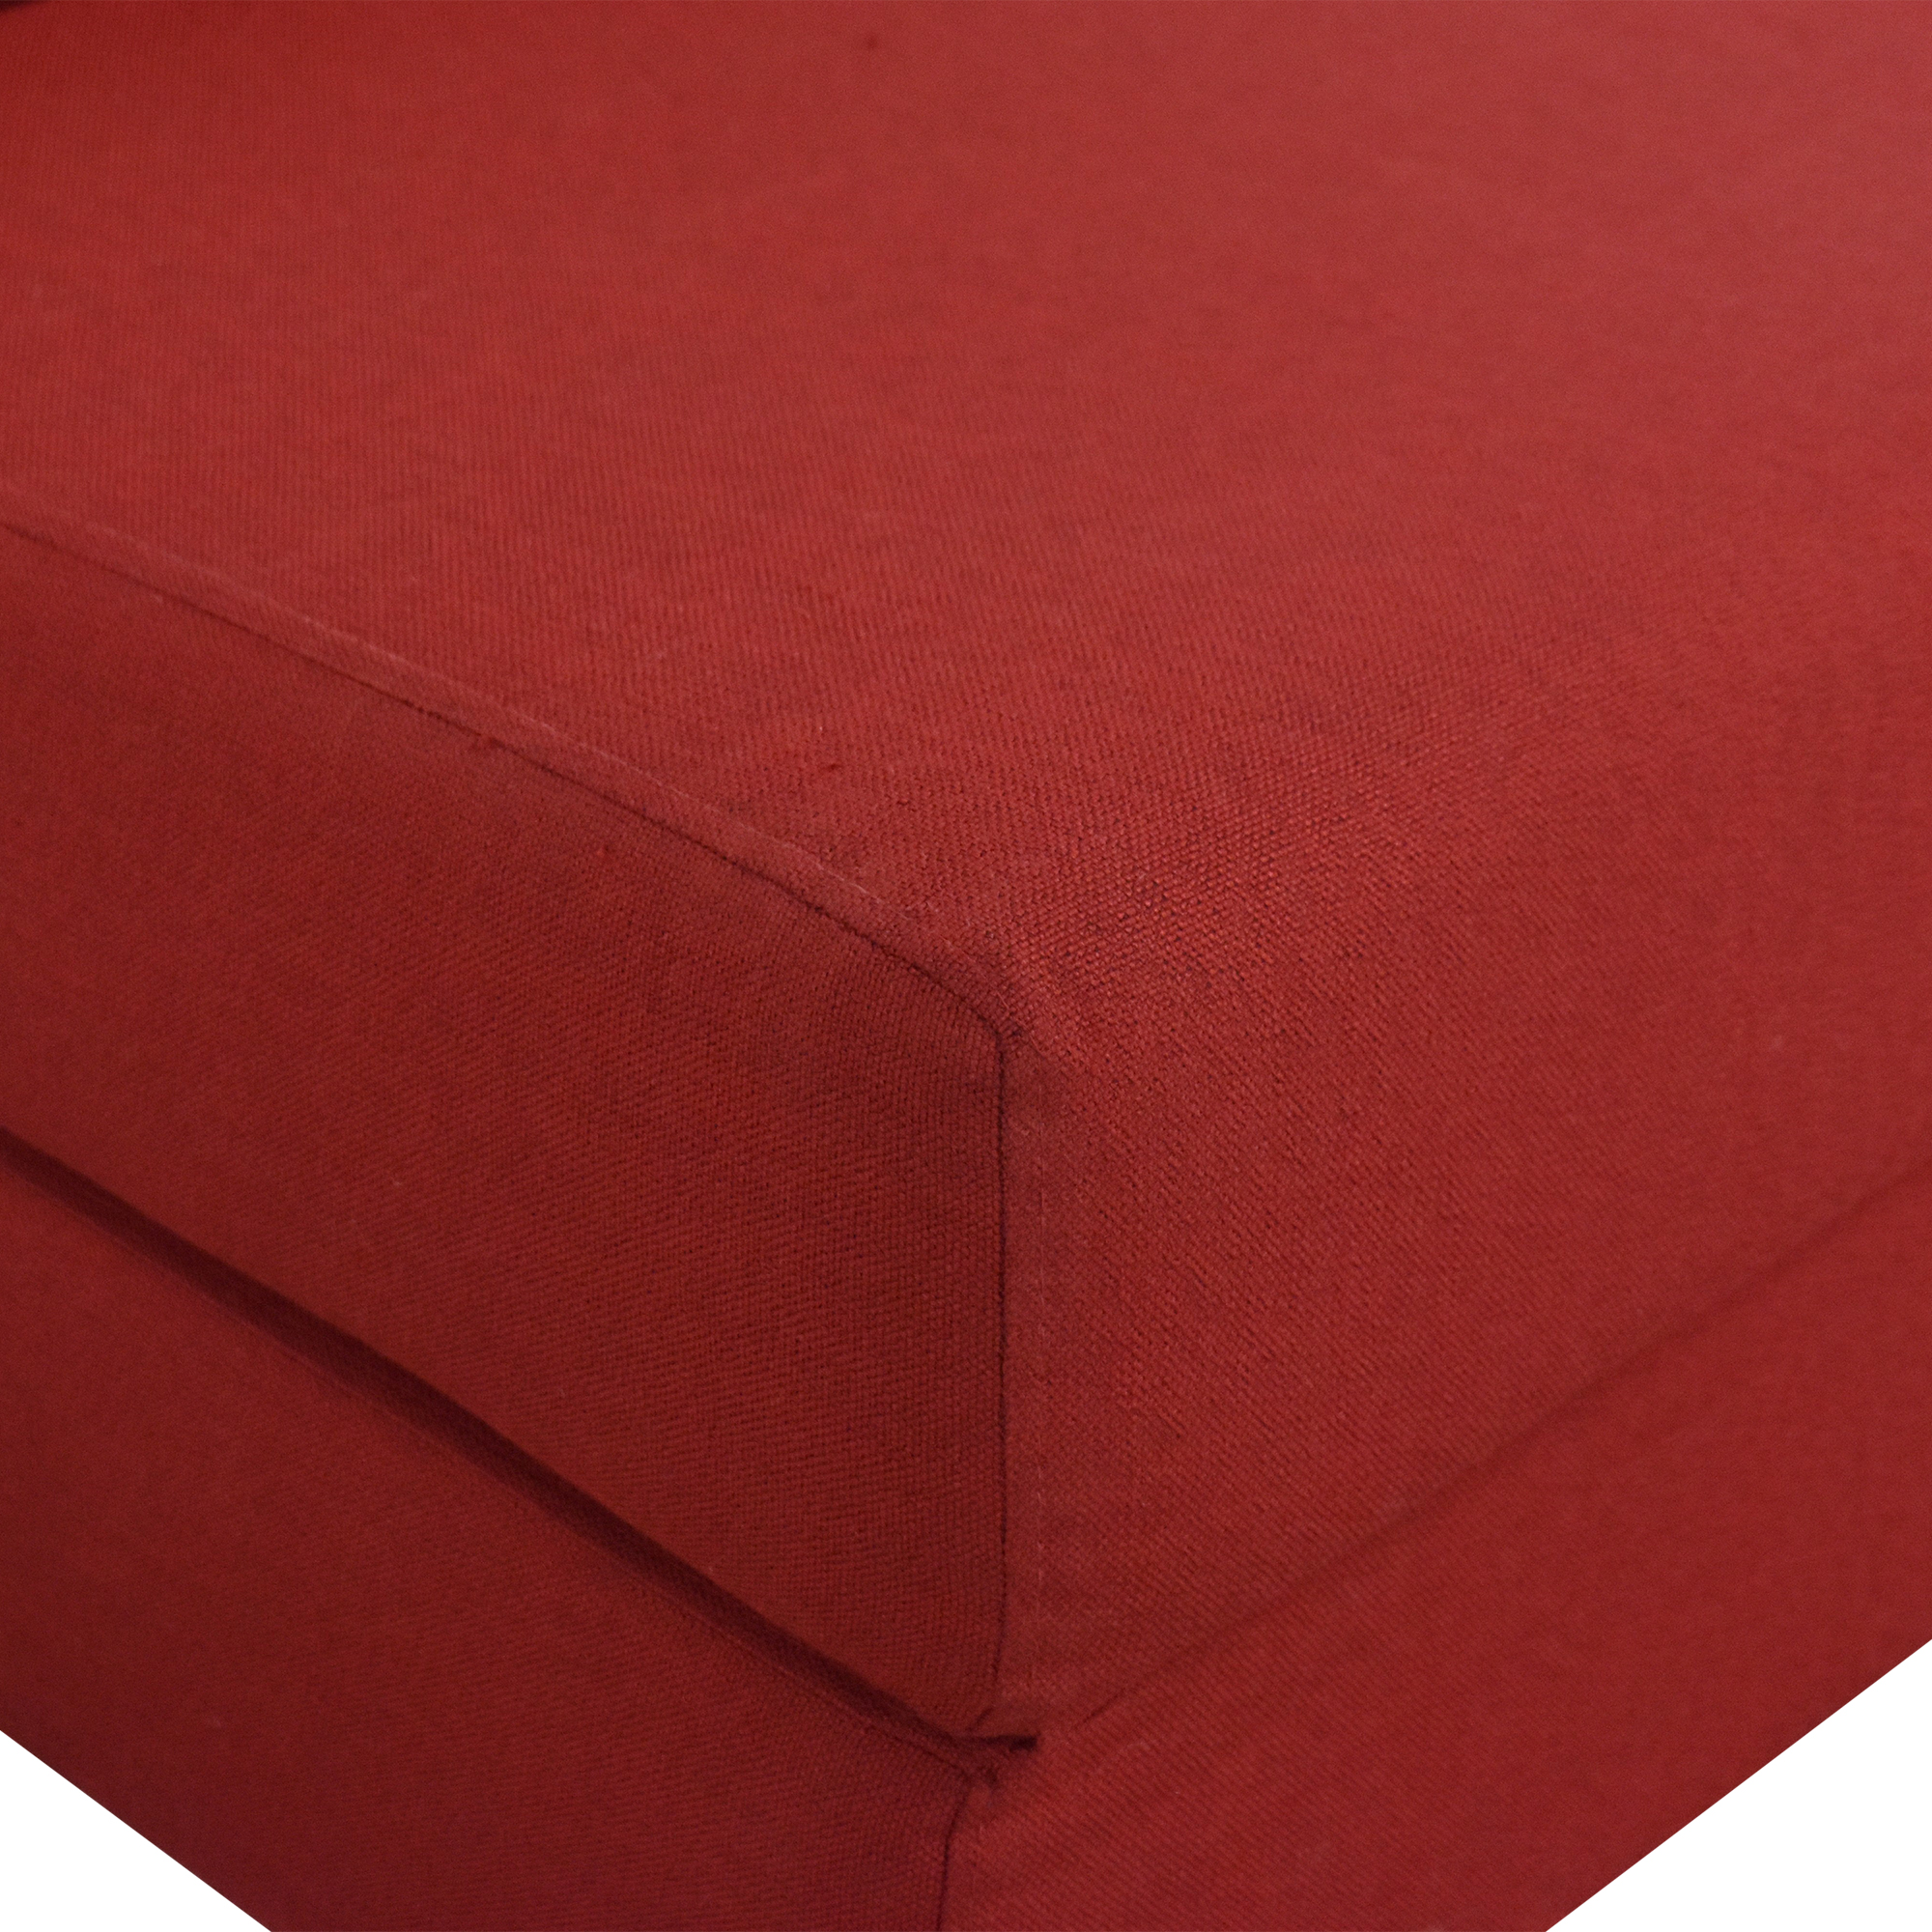 Lazzoni Lazzoni Mini Seat Packing Sofa Bed ma